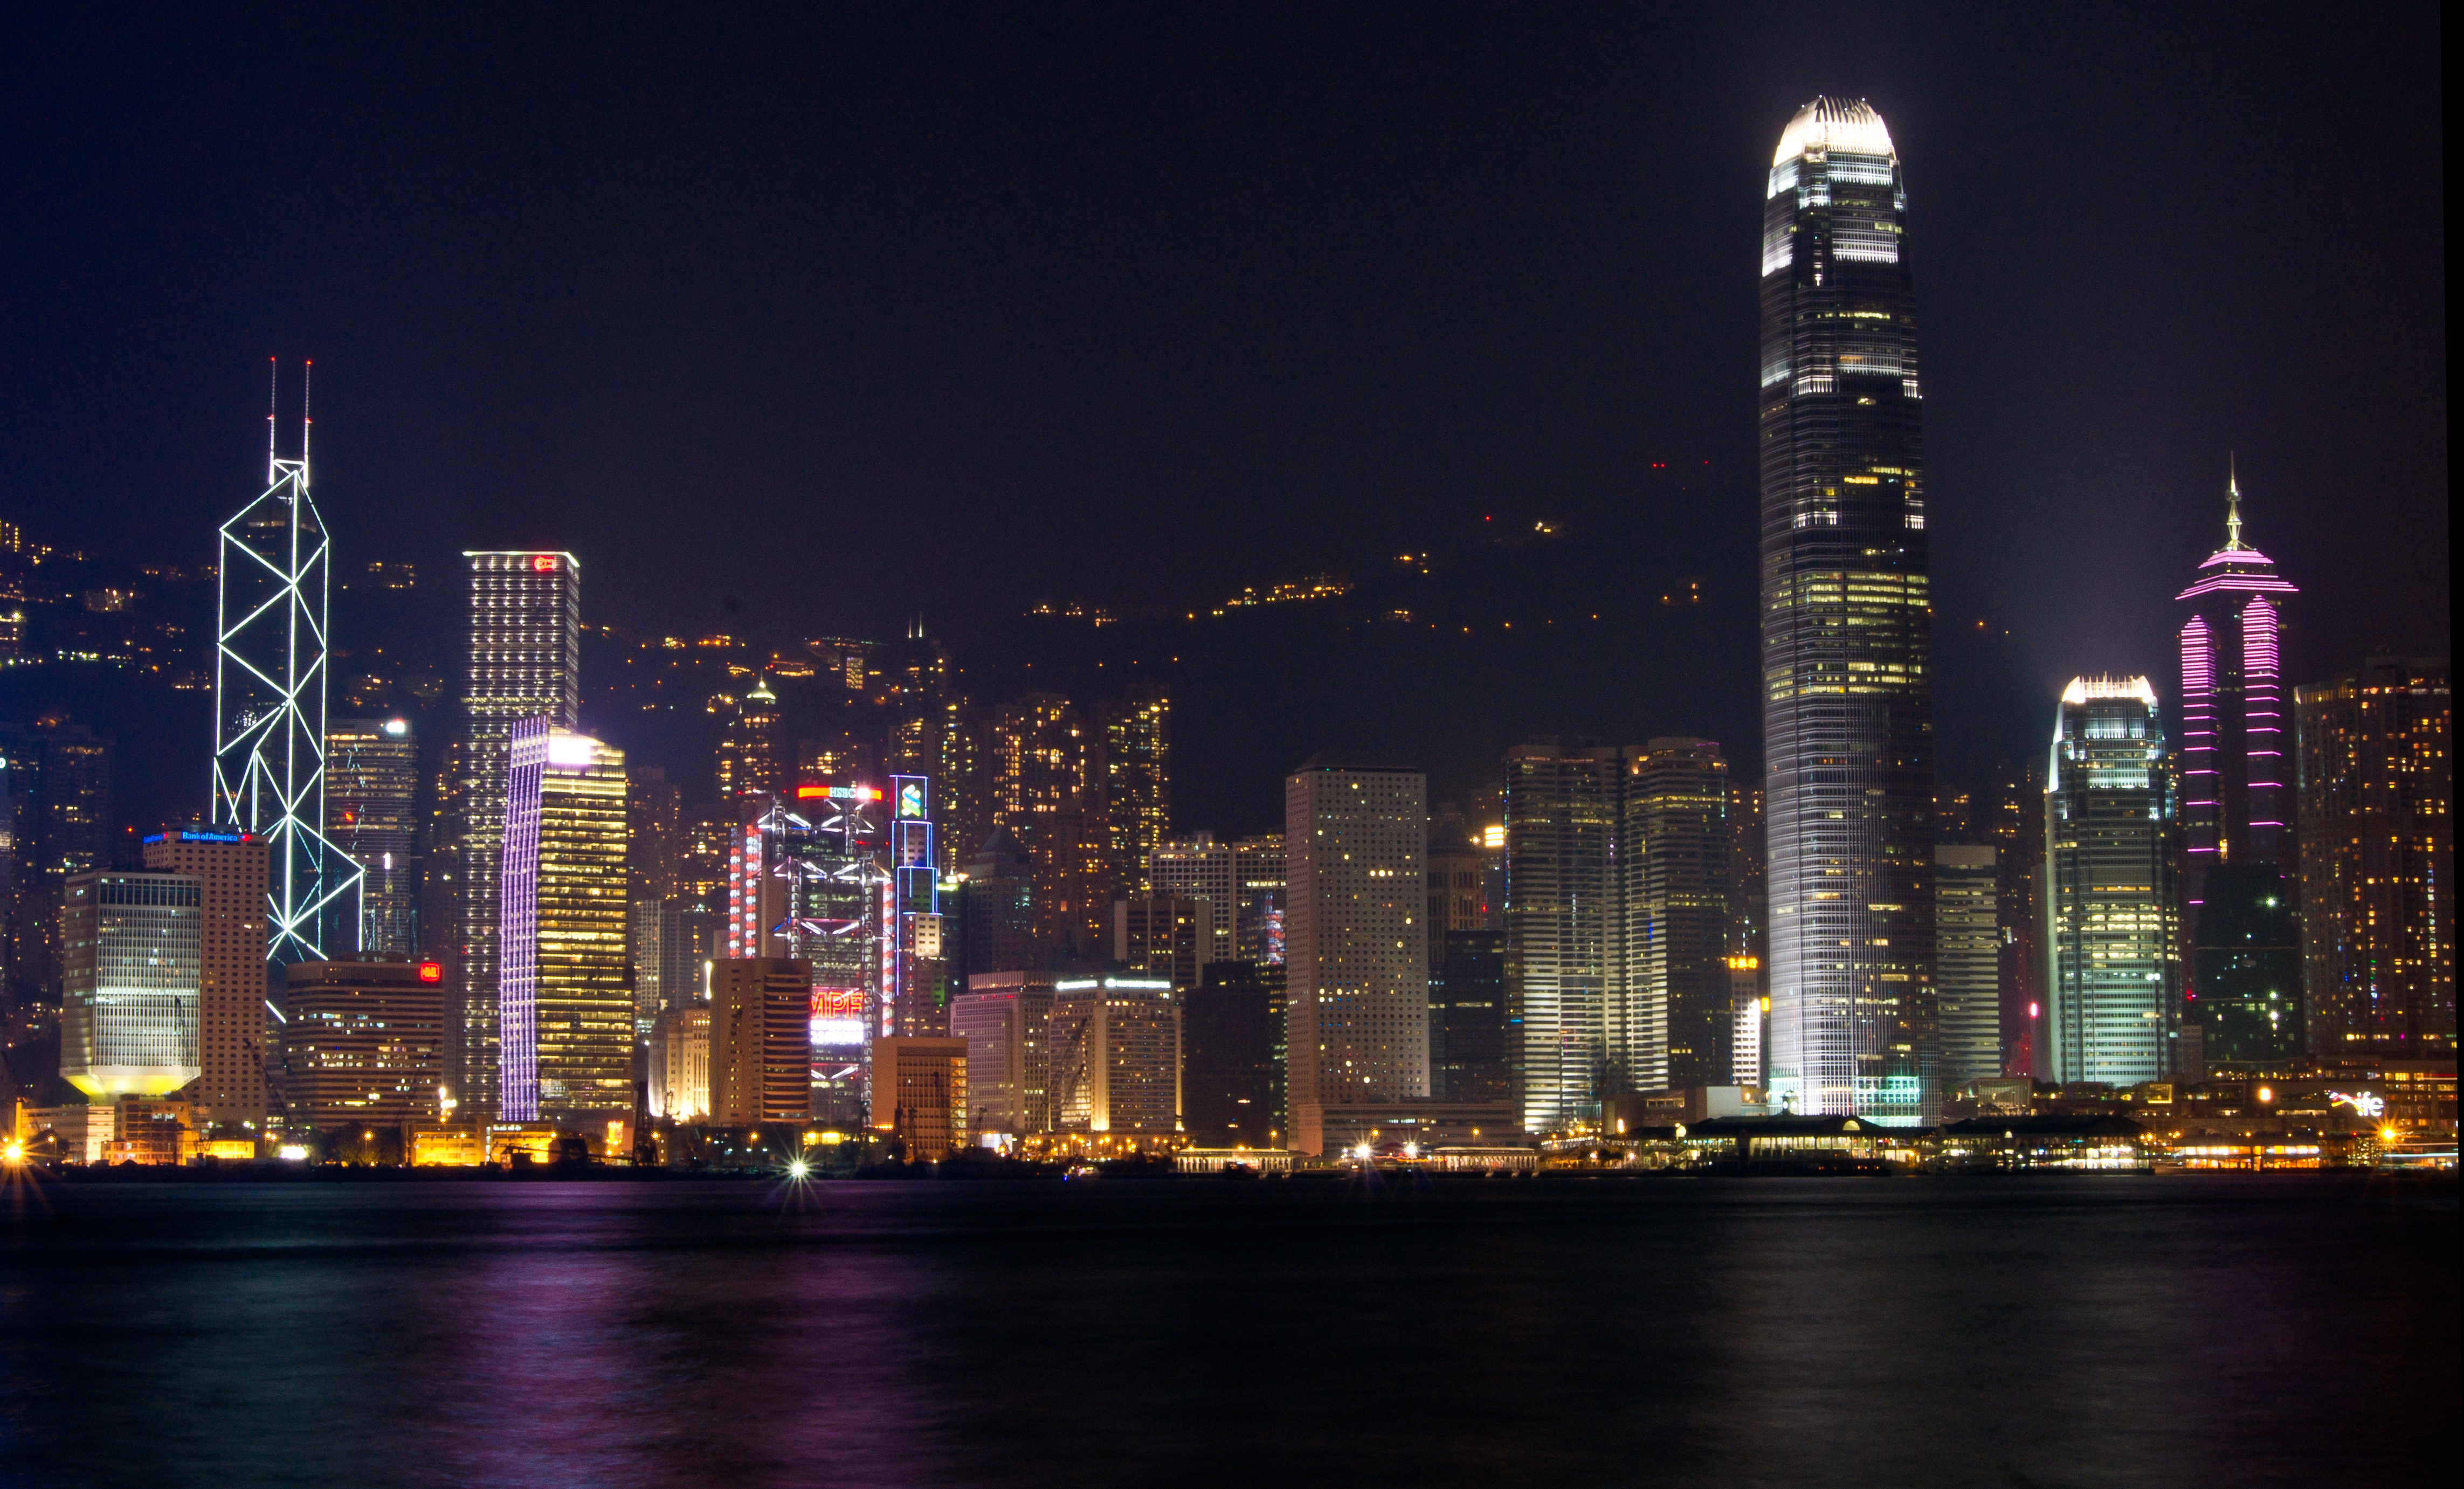 night city view hongkong singapore and jakarta taufik